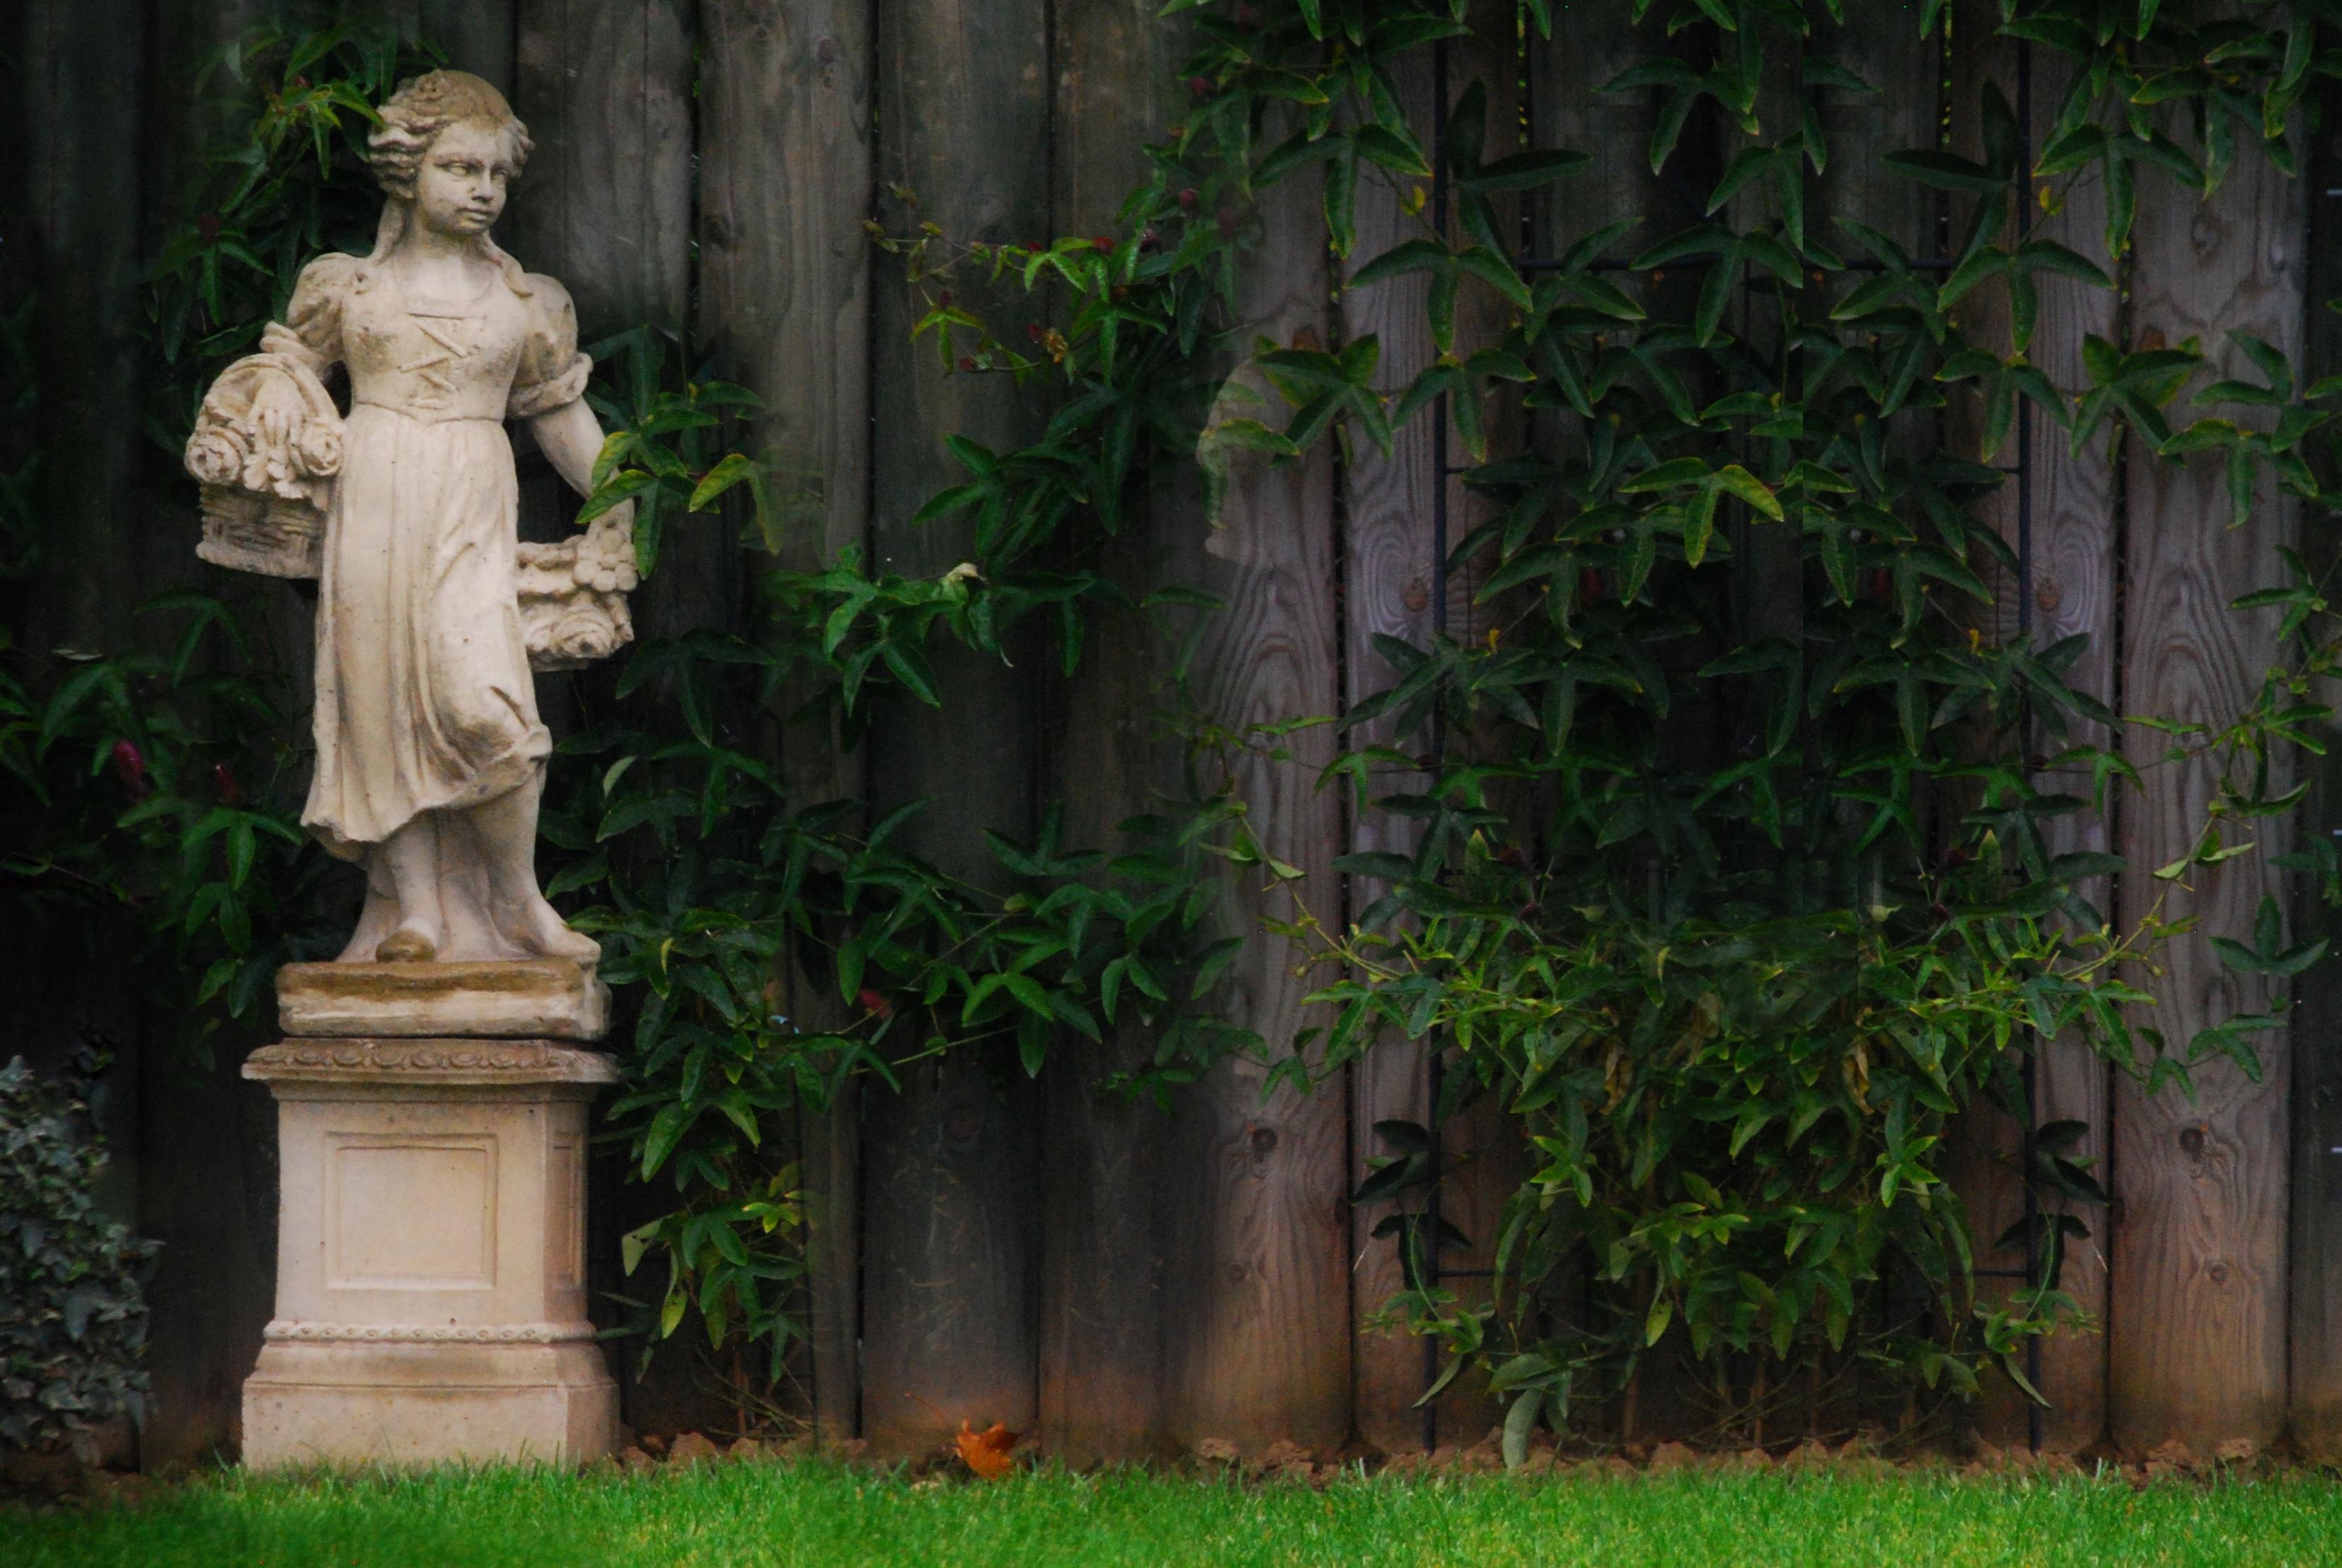 Girl Monument Statue Decoration Jungle Garden Sculpture Art Temple Gardens  Stone Figure Garden Statue Ornamental Garden